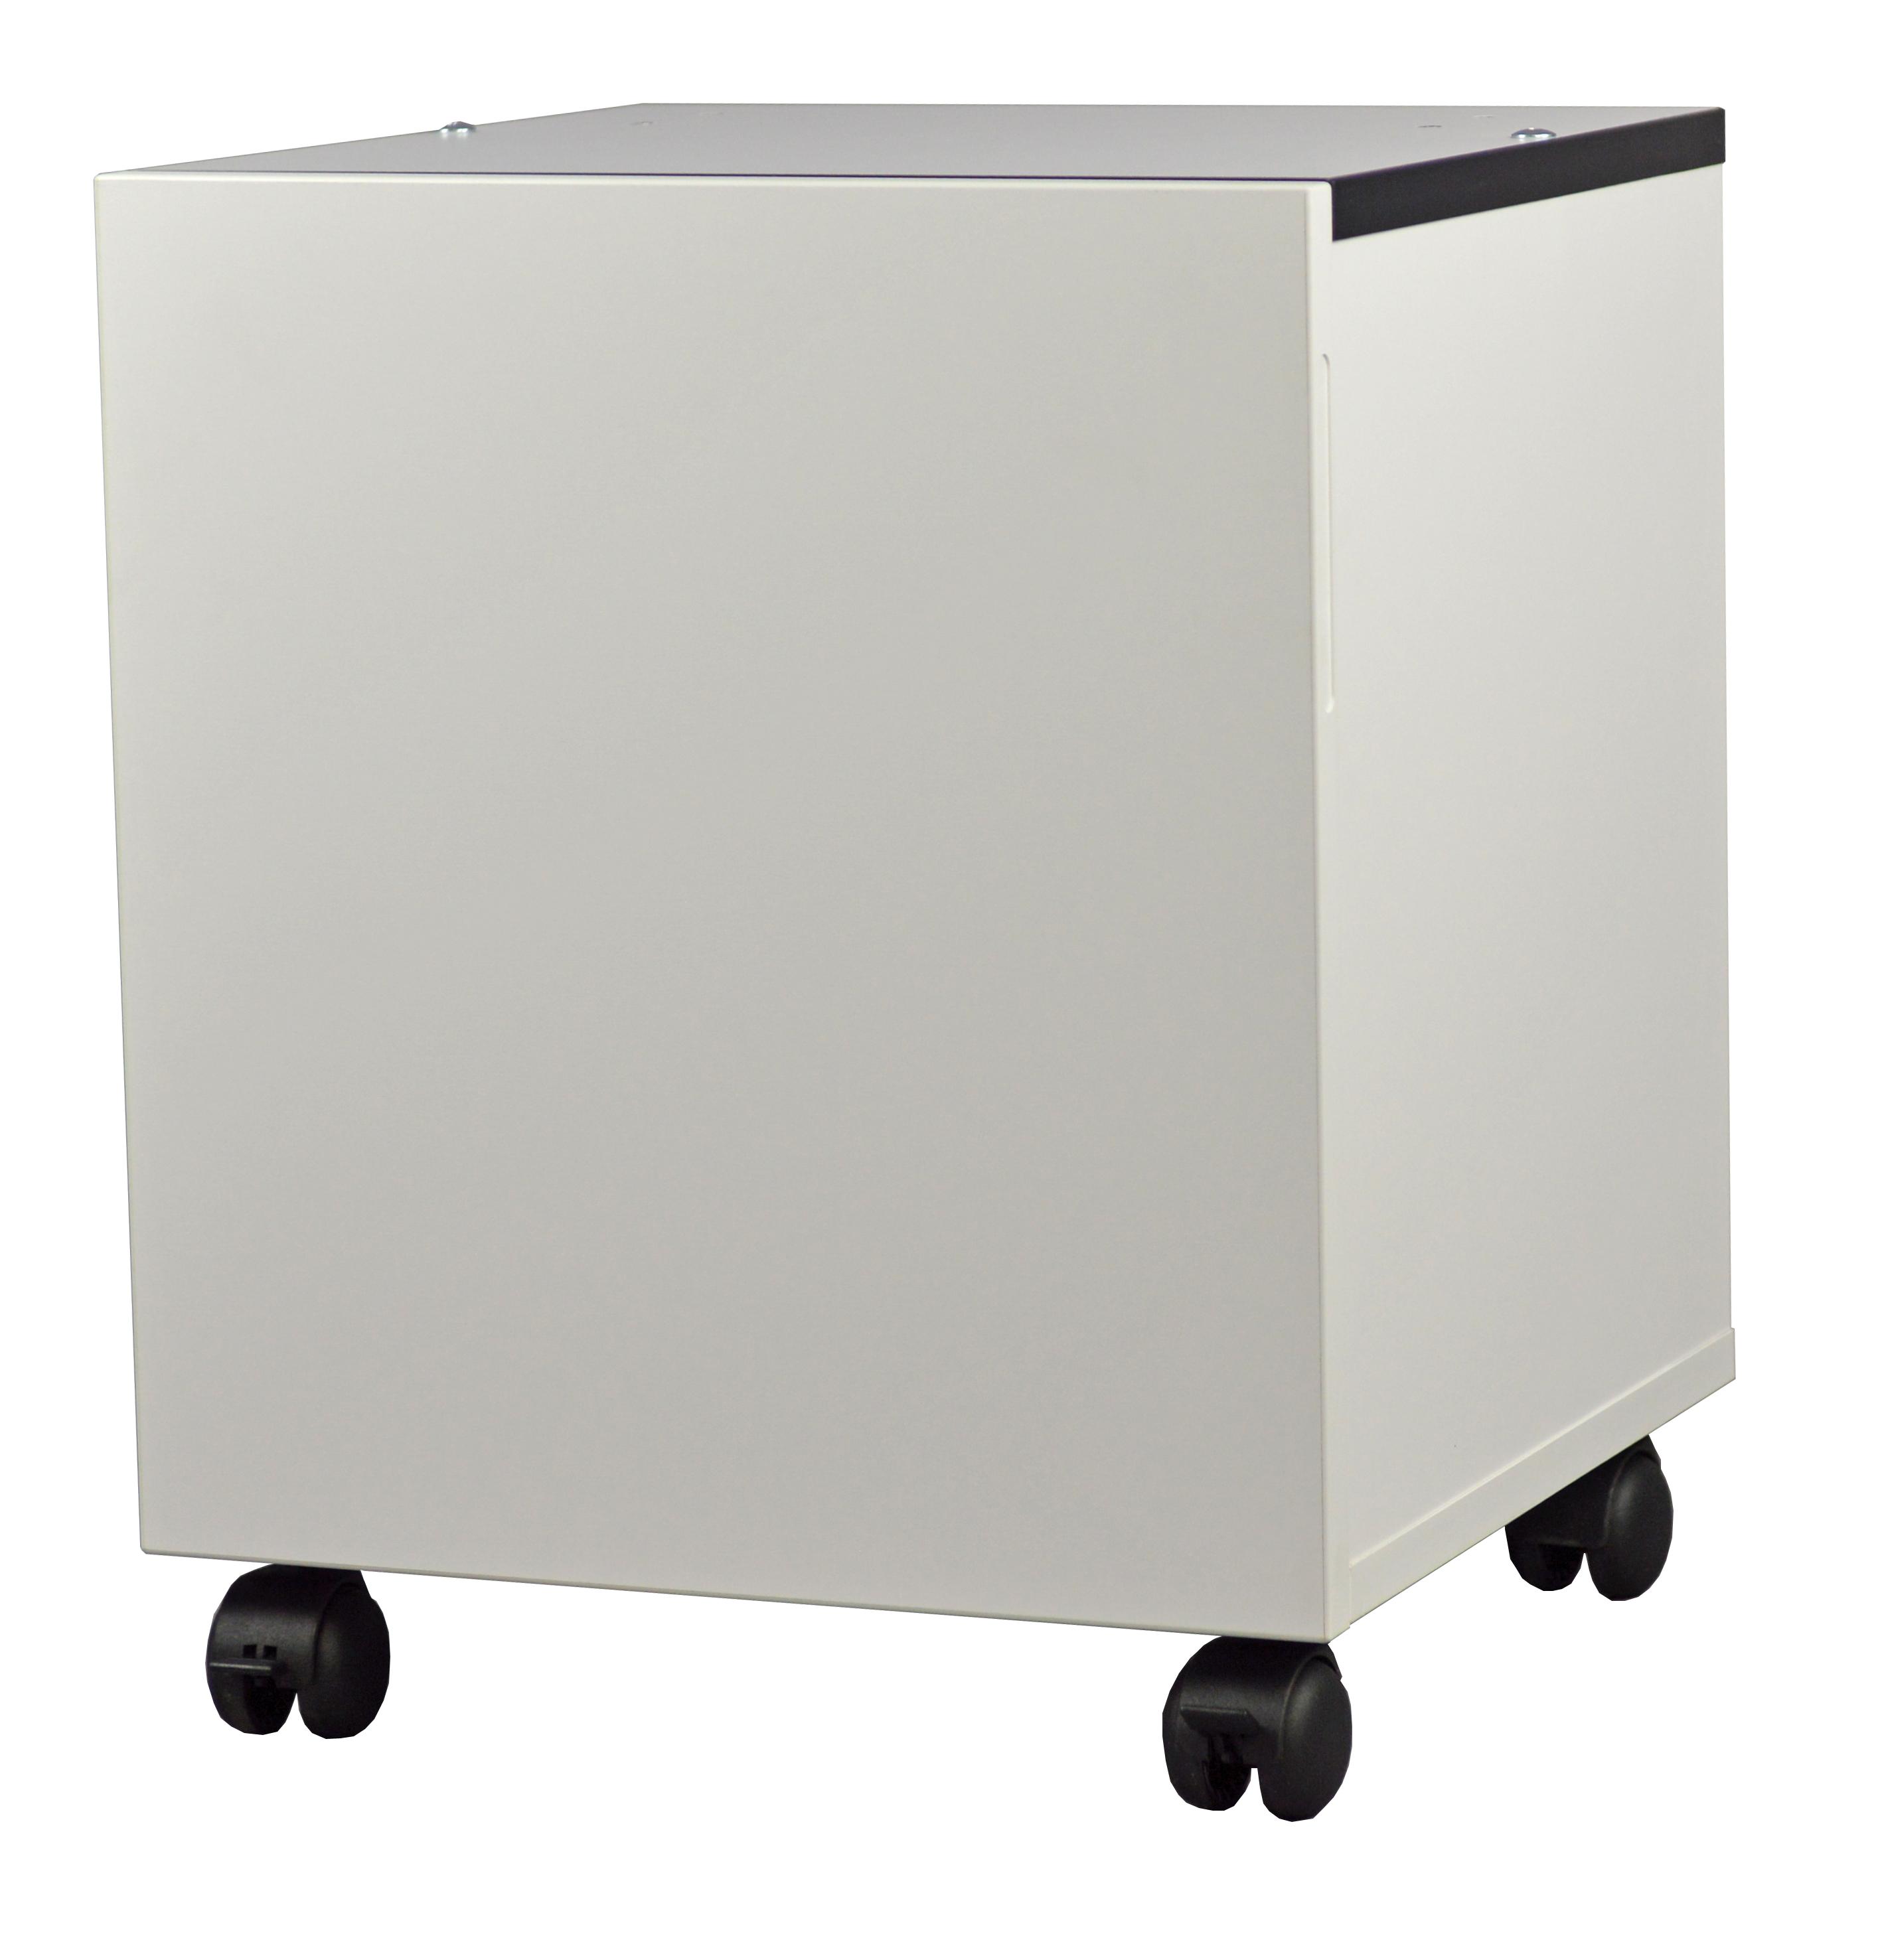 Kyocera CB-1100